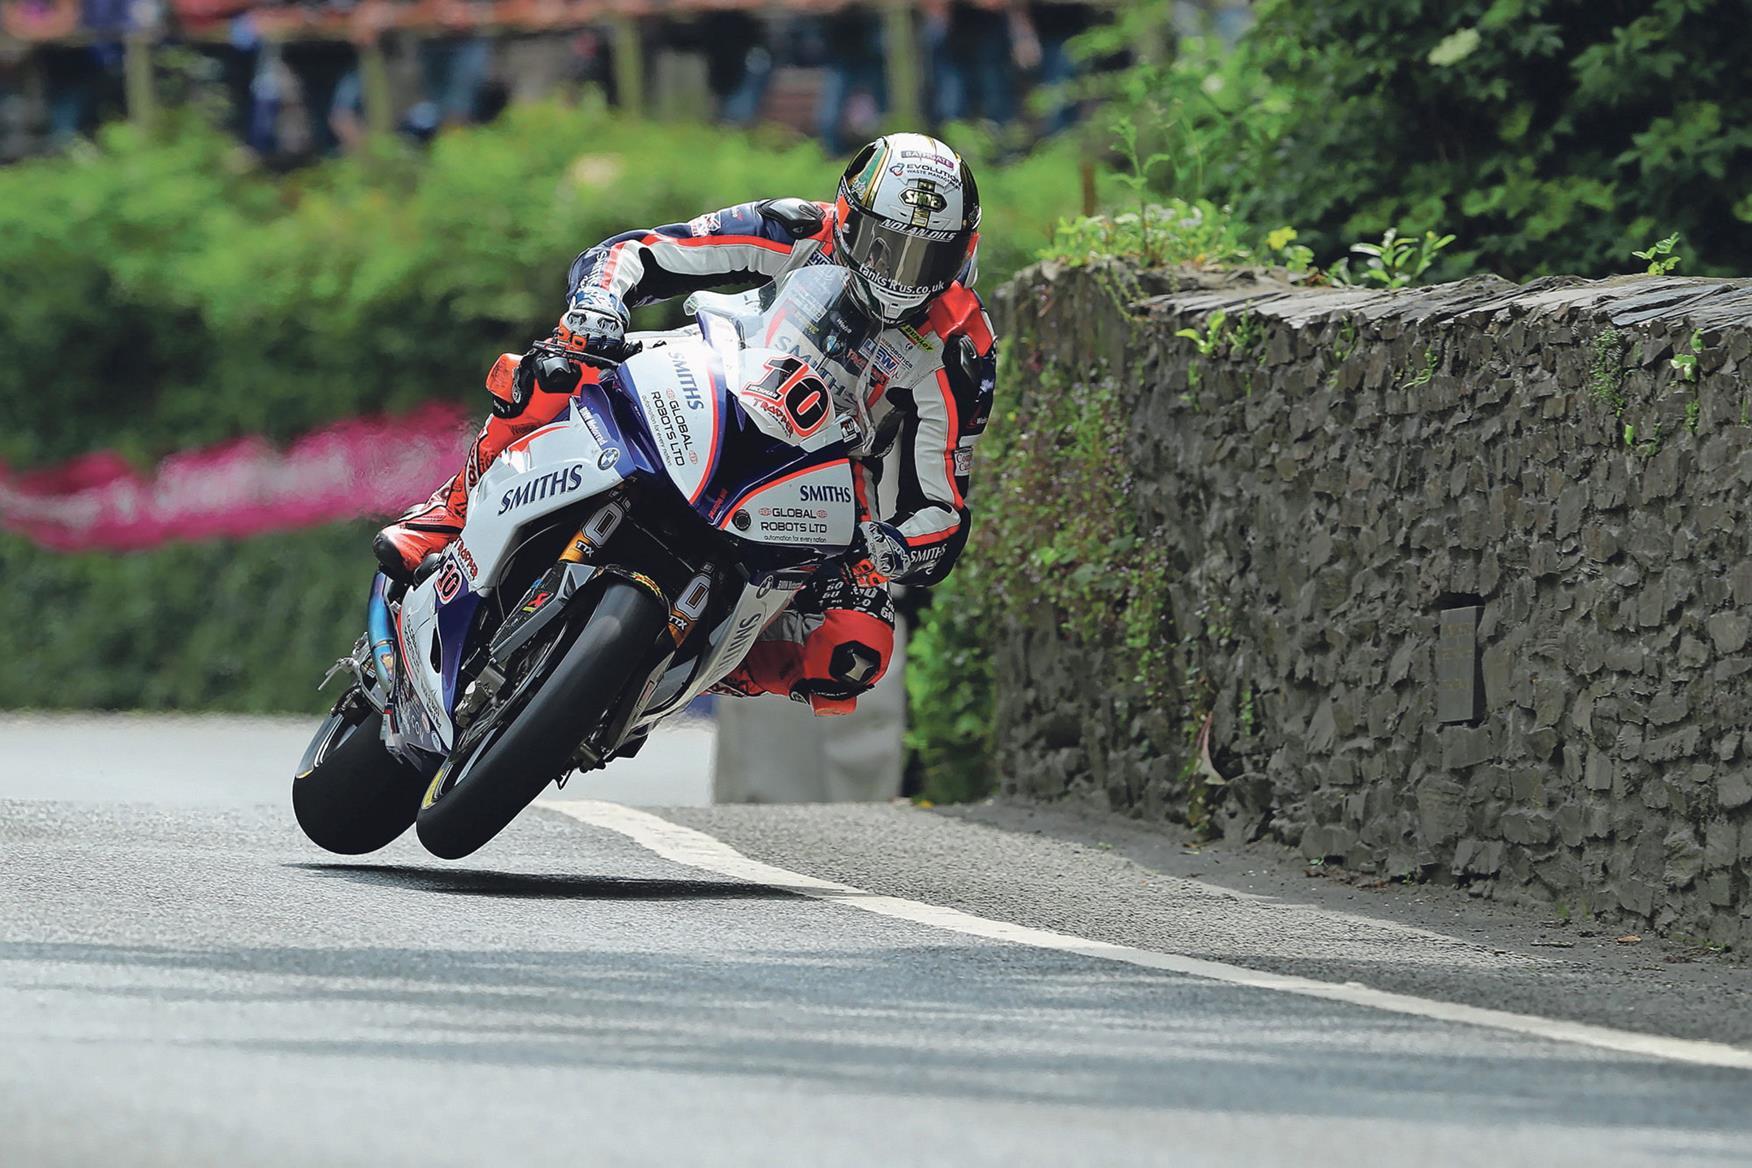 Hickman rides into TT history books